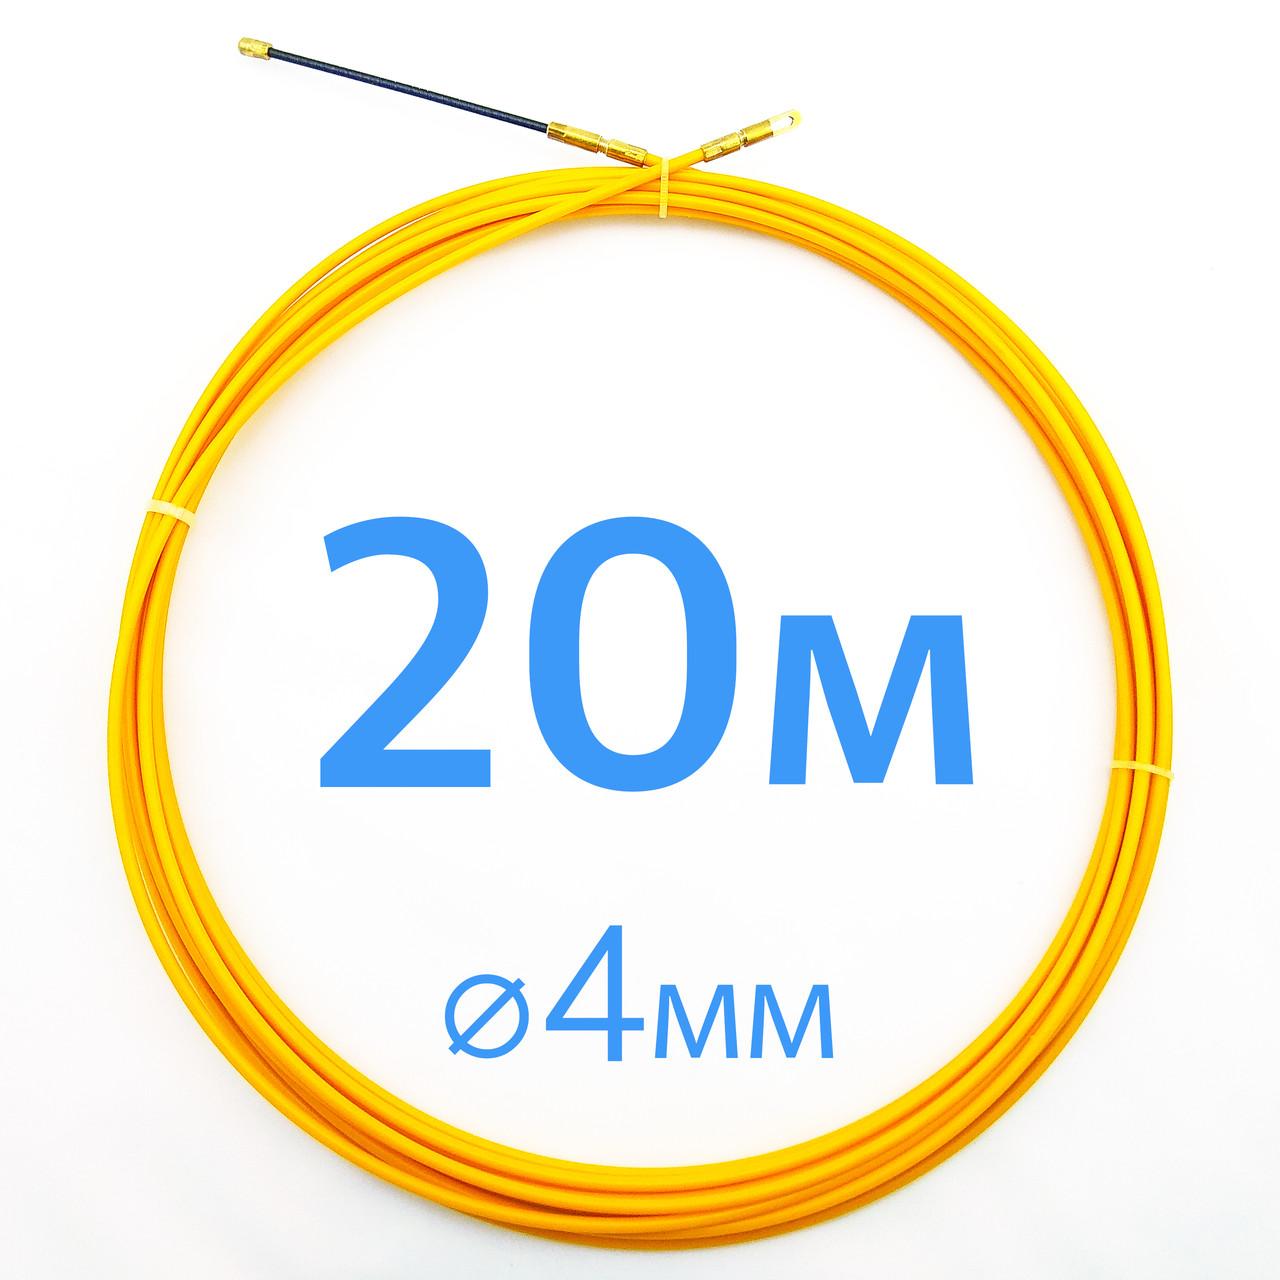 Кабельная протяжка, стеклопруток 4мм х 20м + 2 наконечника